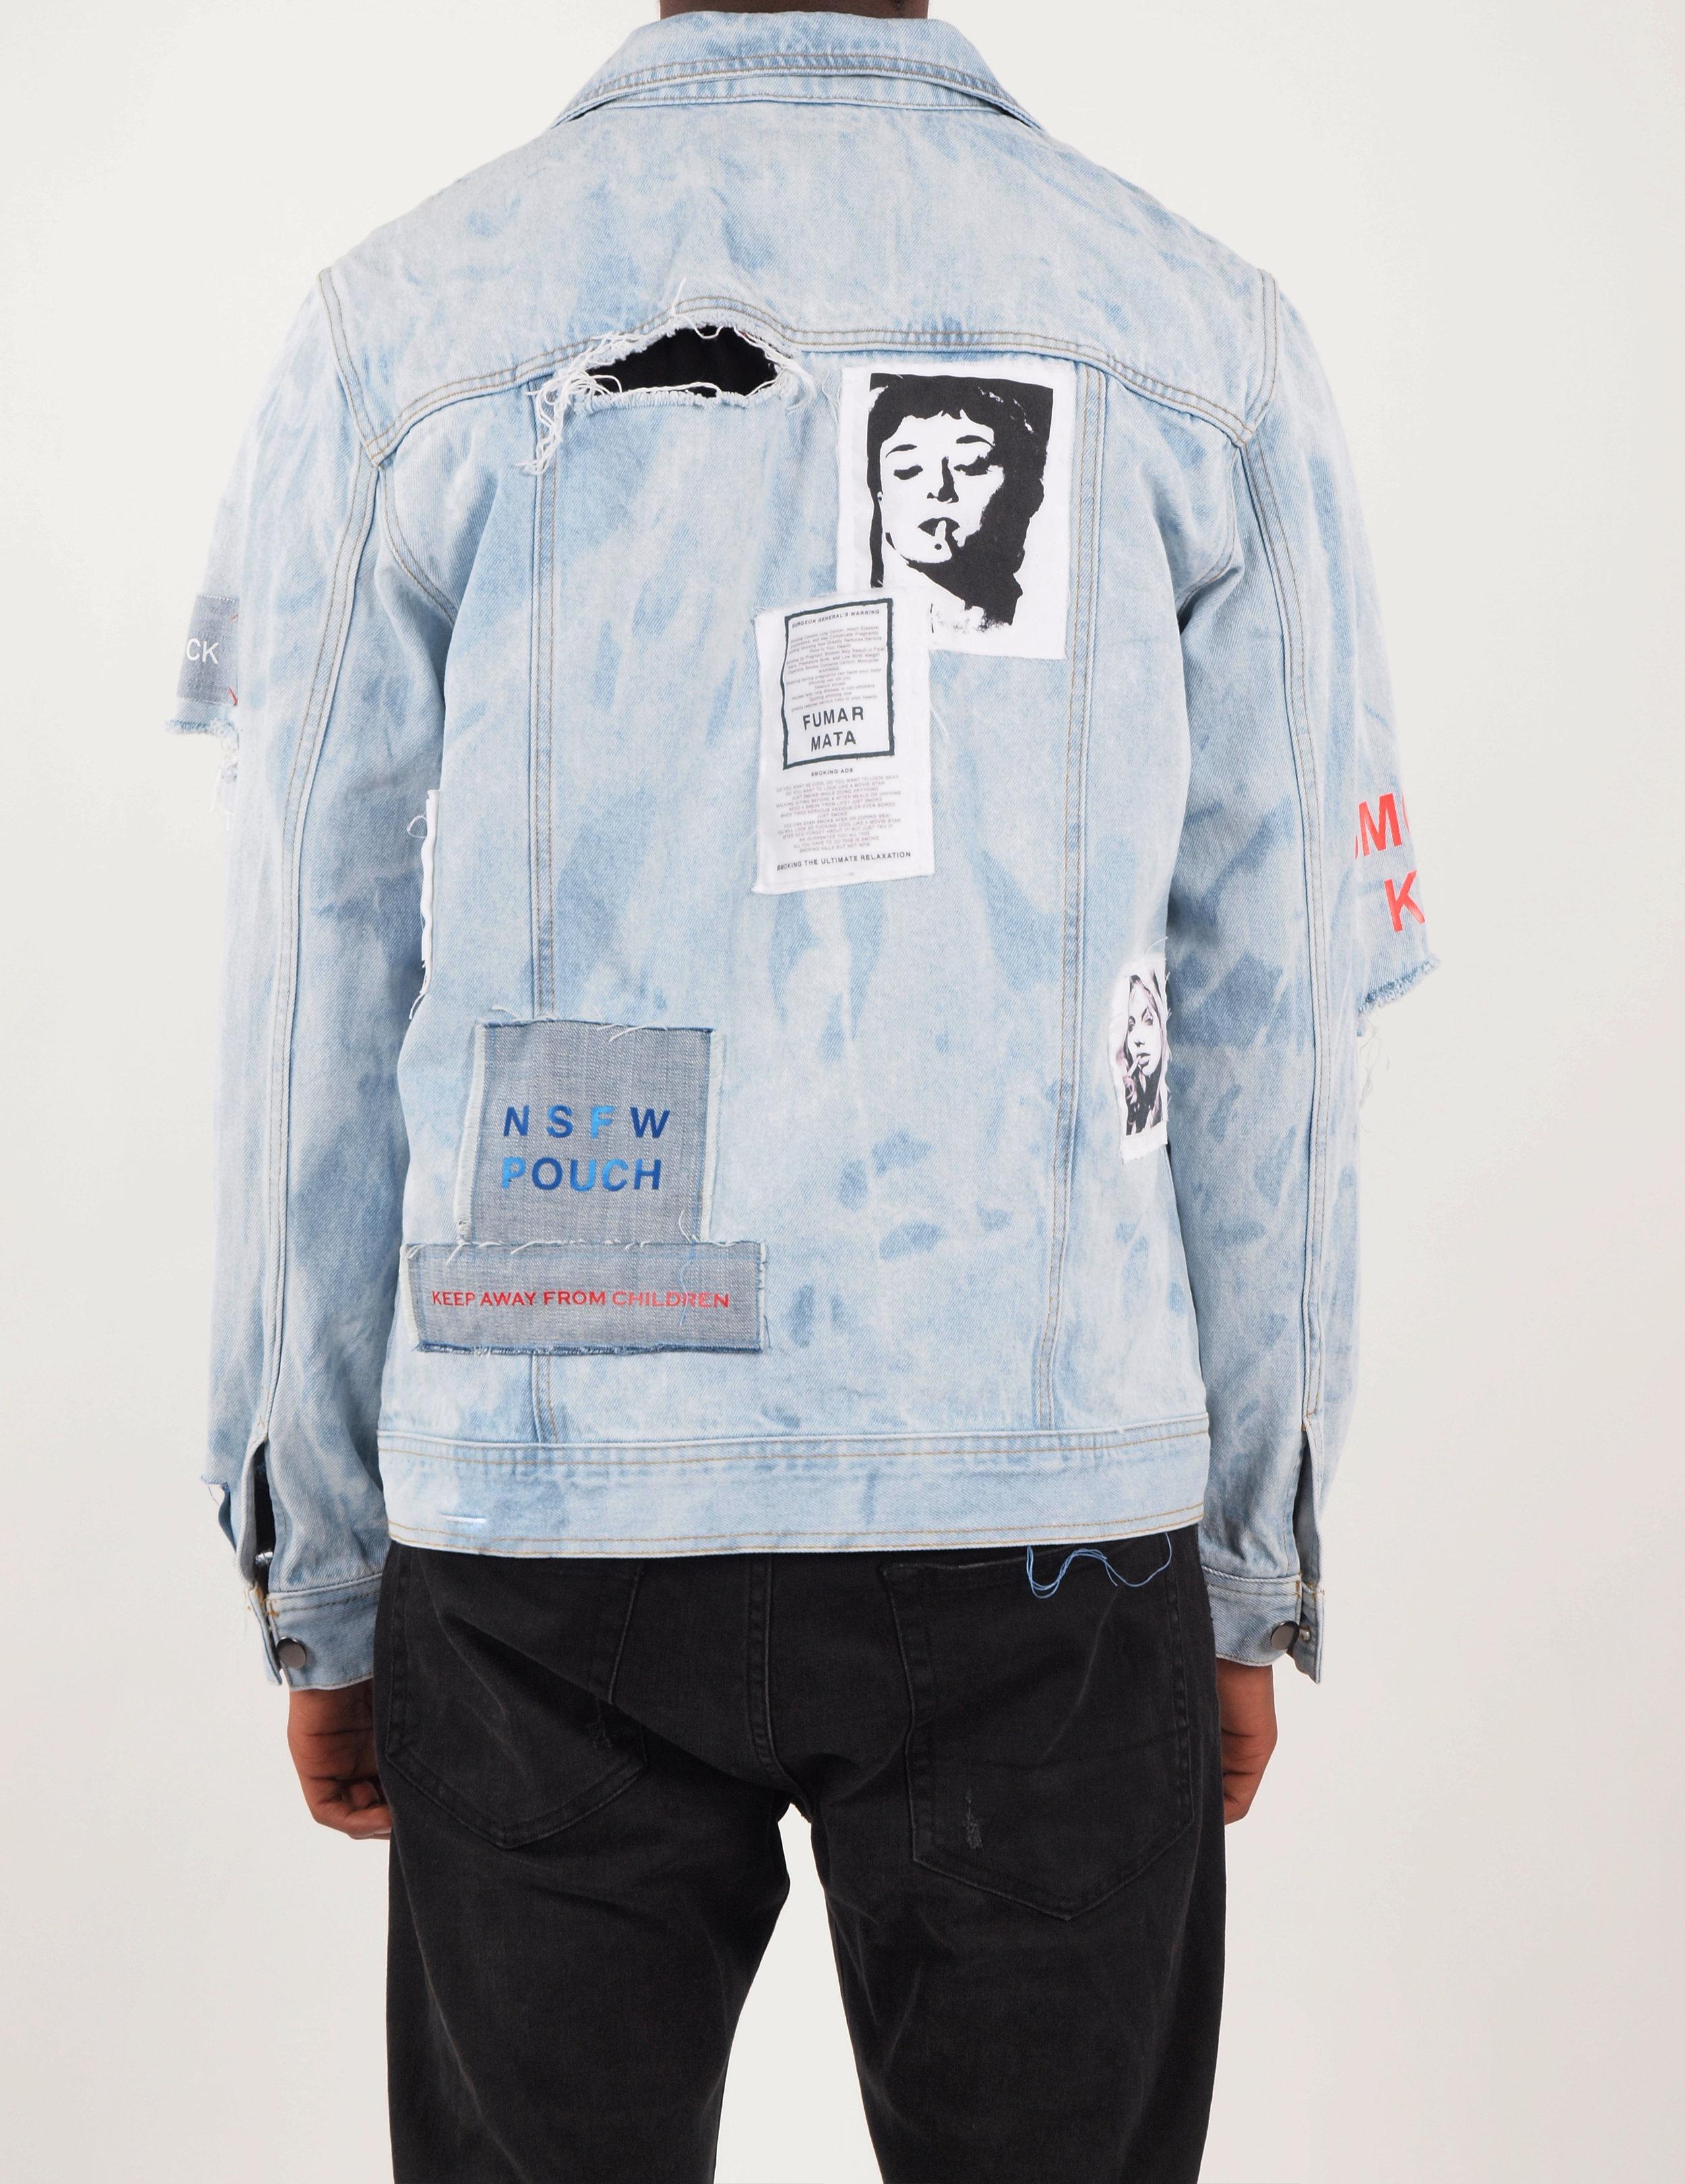 textured blue denim jacket back.jpg